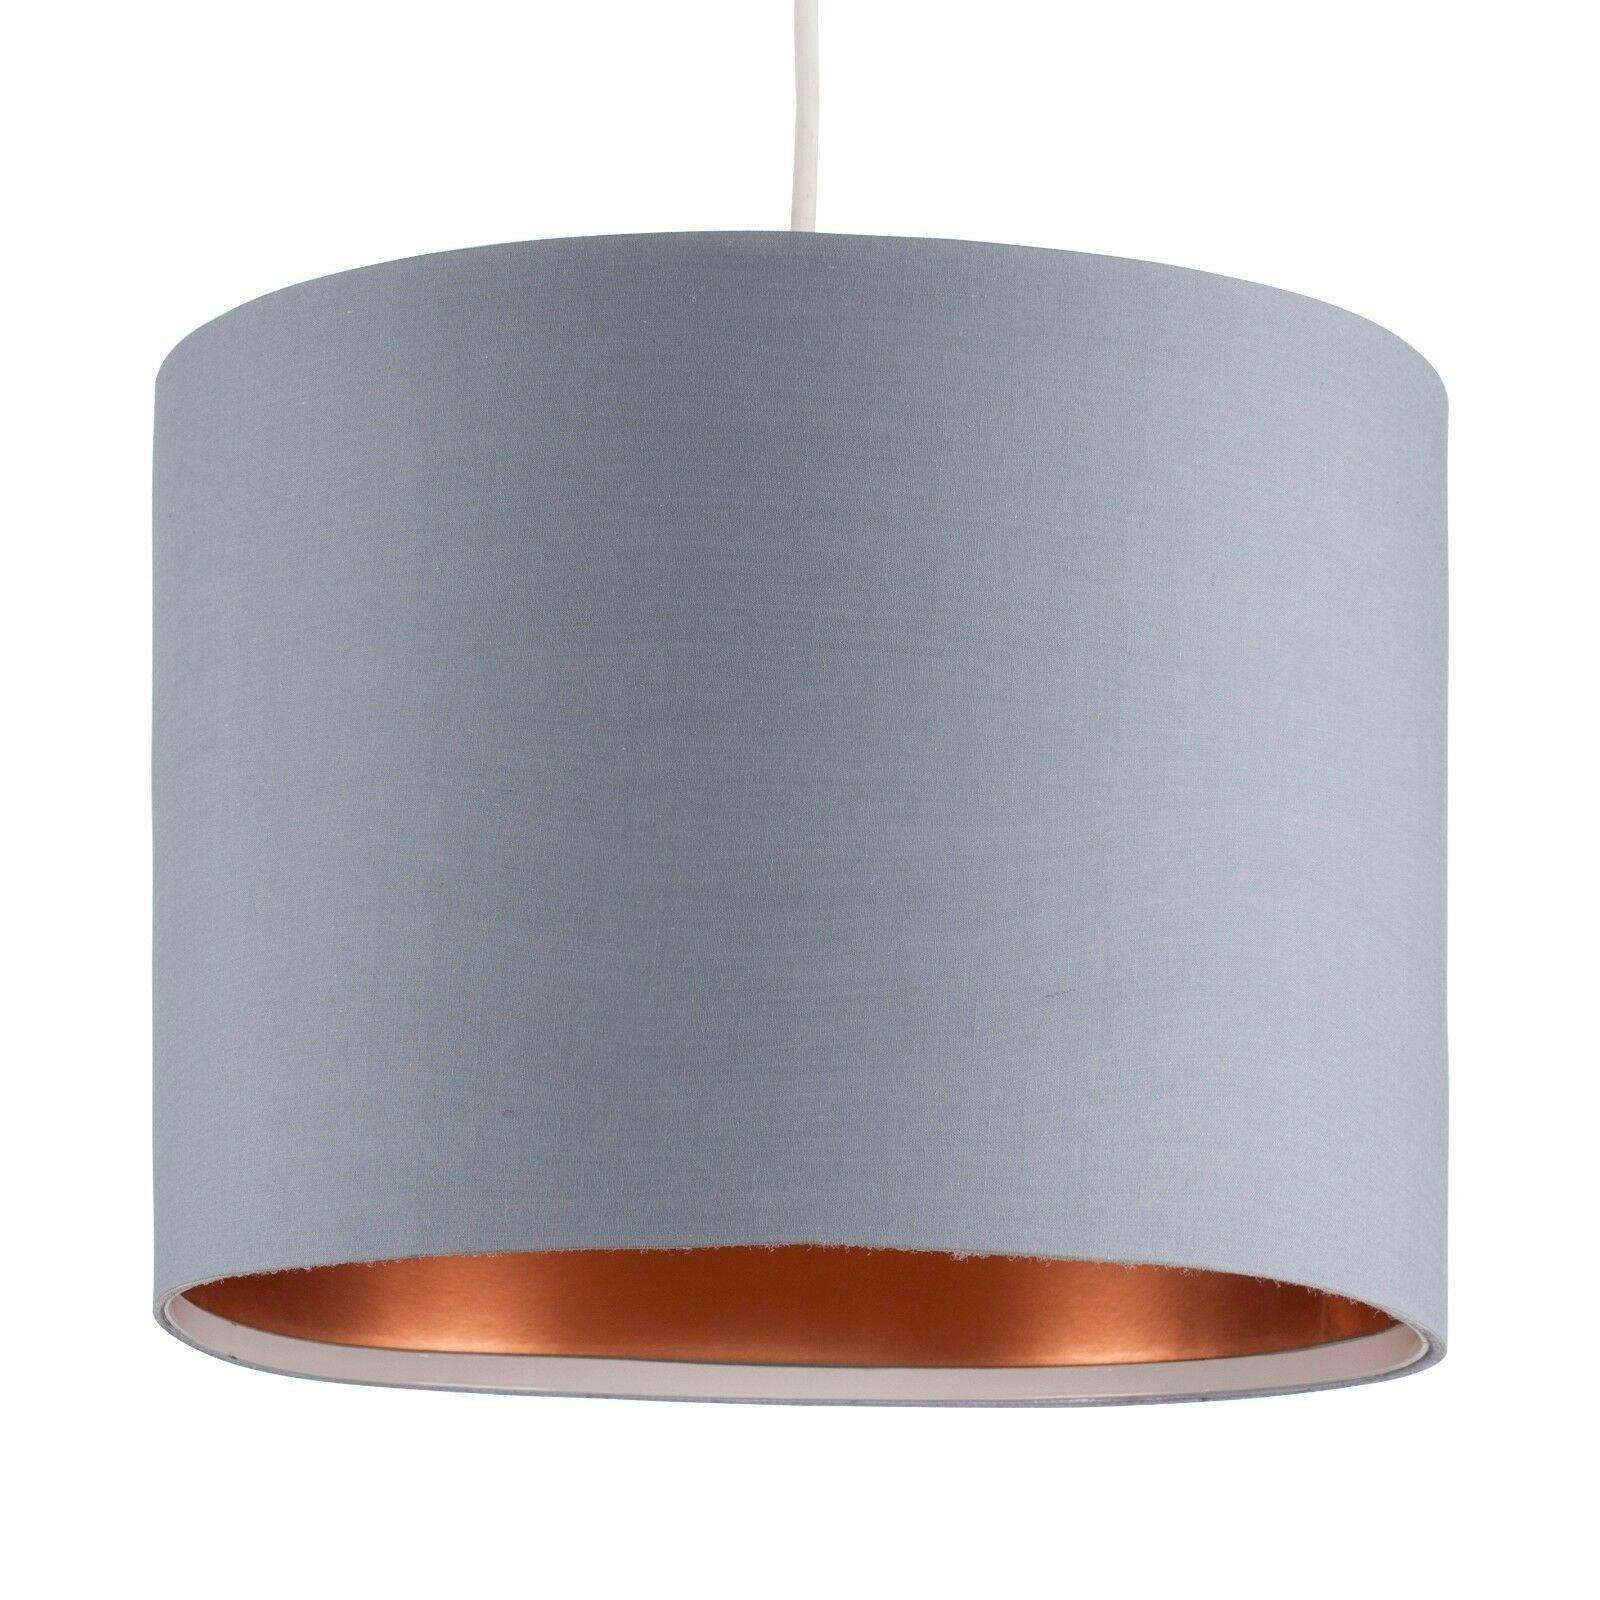 Tela-moderna-algodon-facil-ajuste-Techo-Colgante-Pantalla-De-Mesa-tonos-de-luz-de-tambor miniatura 130